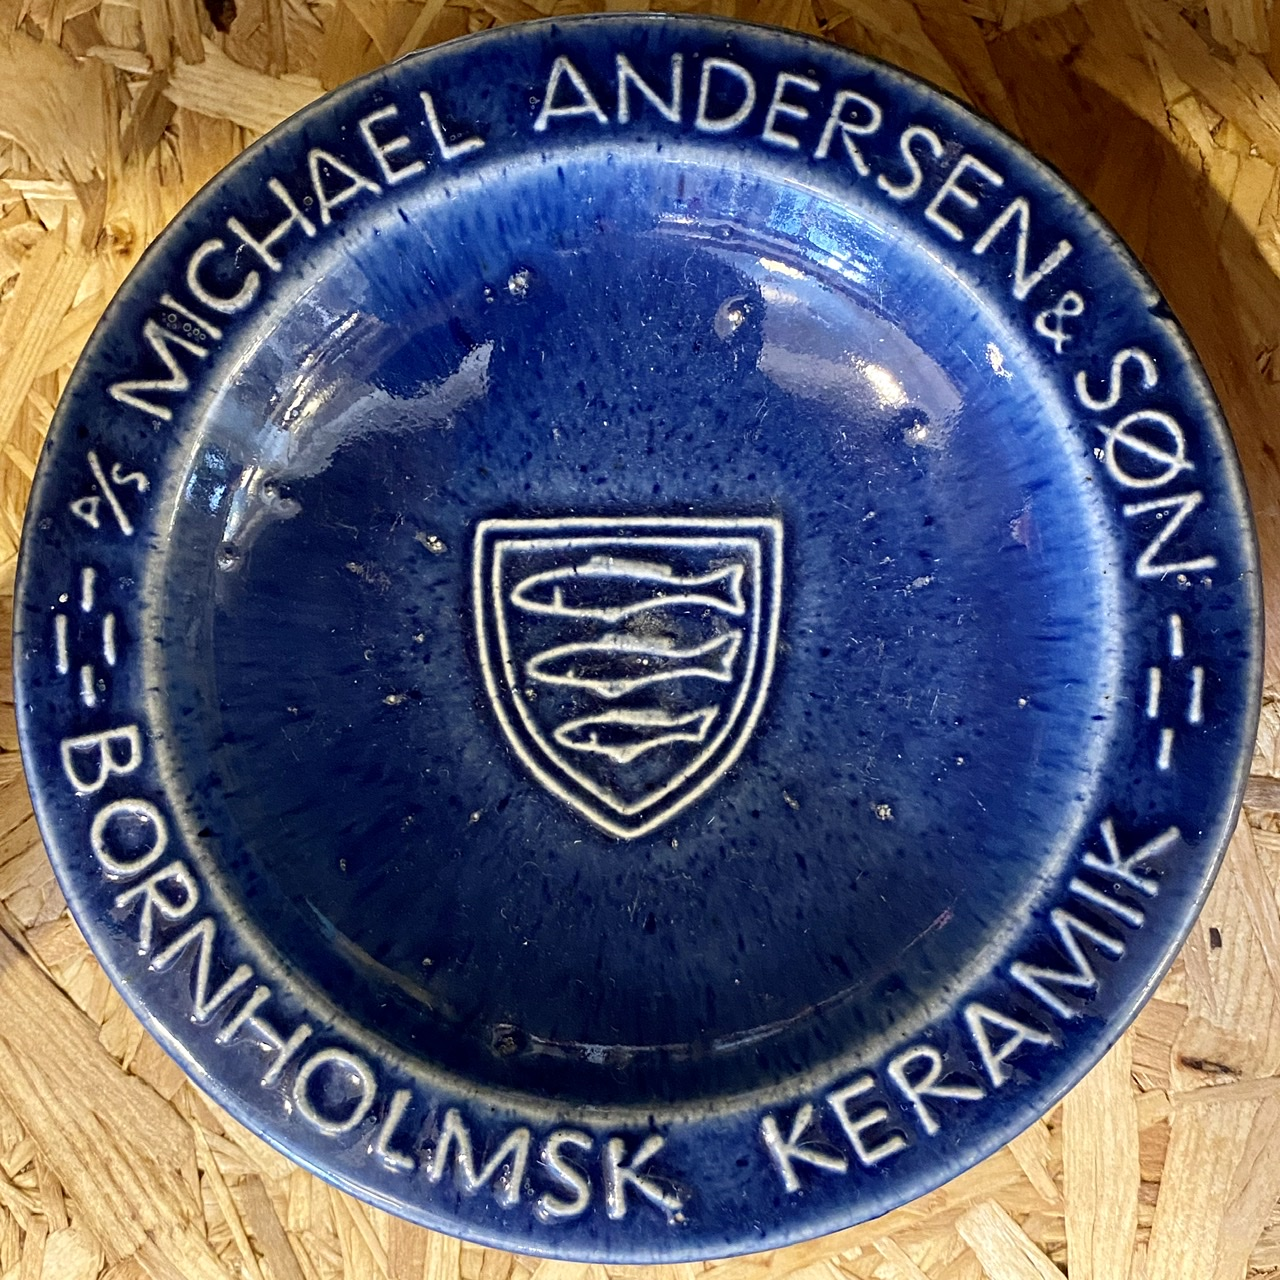 Michael Andersen & Søn - Bornholmsk Keramik - 2020